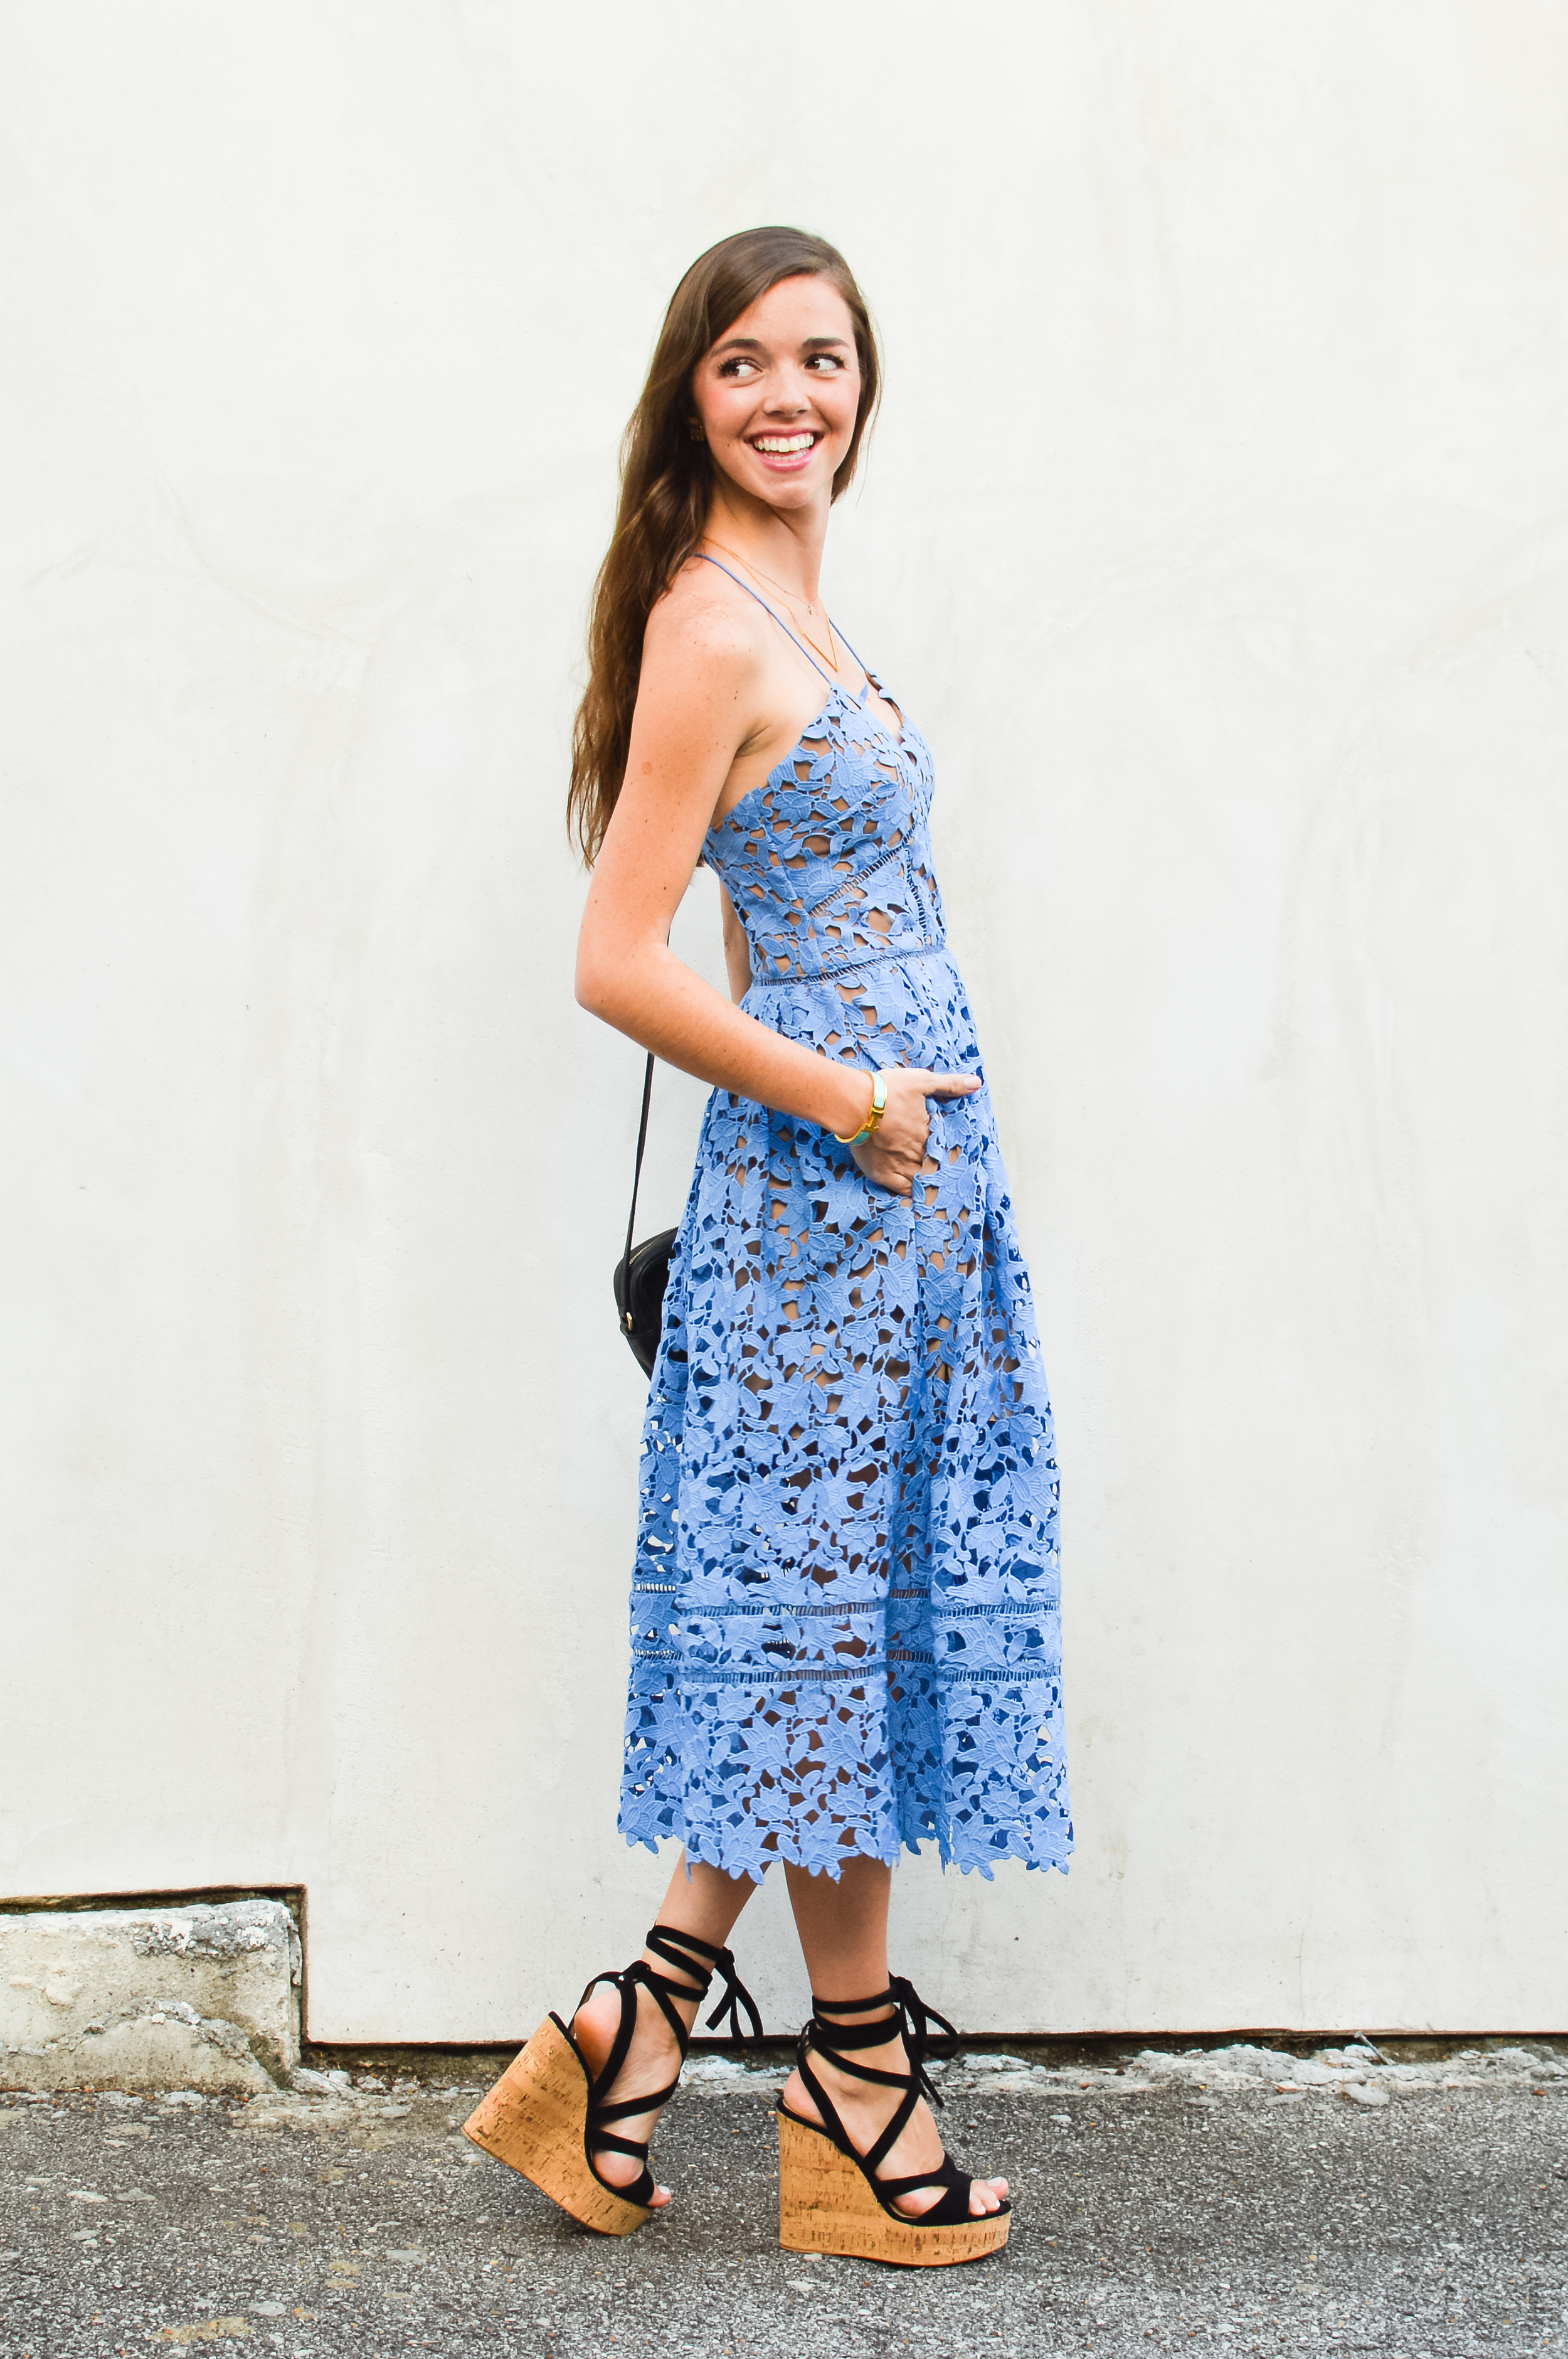 lcb_style_fashion_blogger_selfportrait_dress (14 of 48).jpg